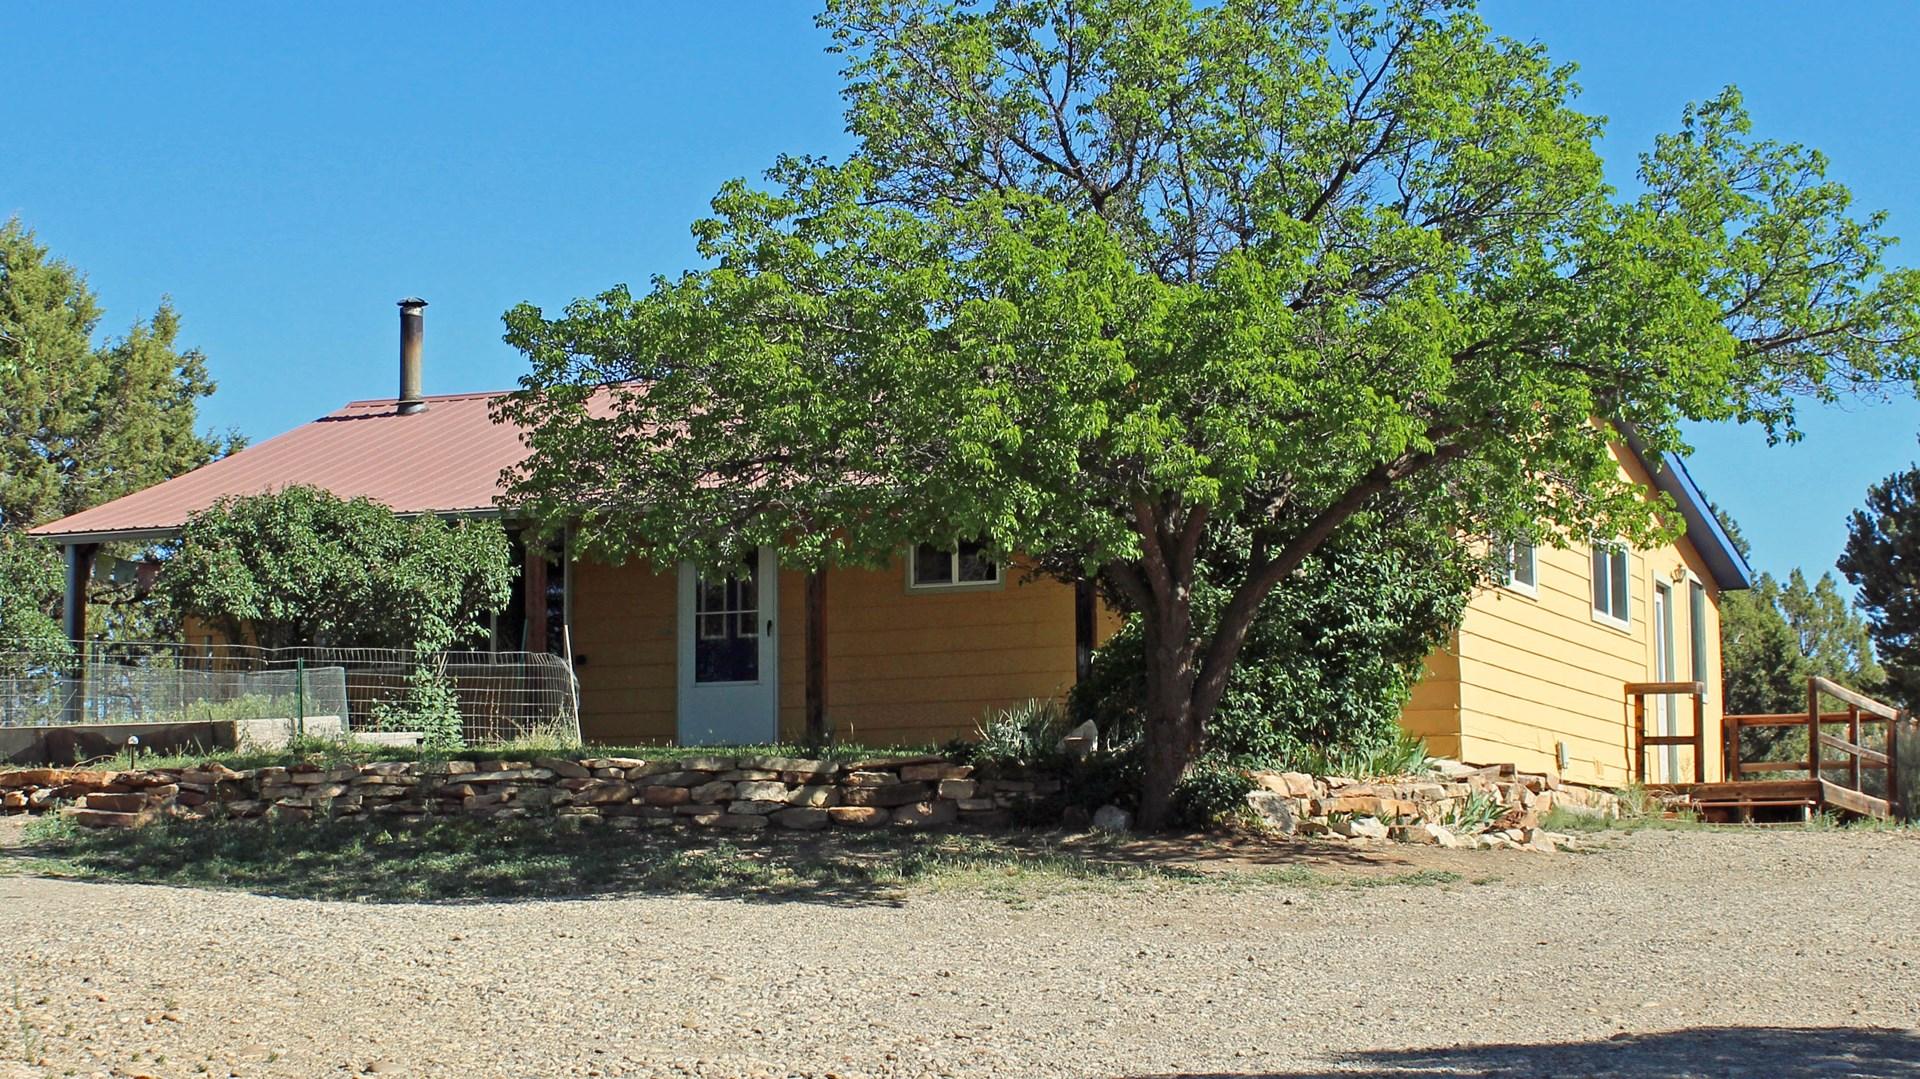 Colorado Home For Sale, Cortez CO with Acreage, Views